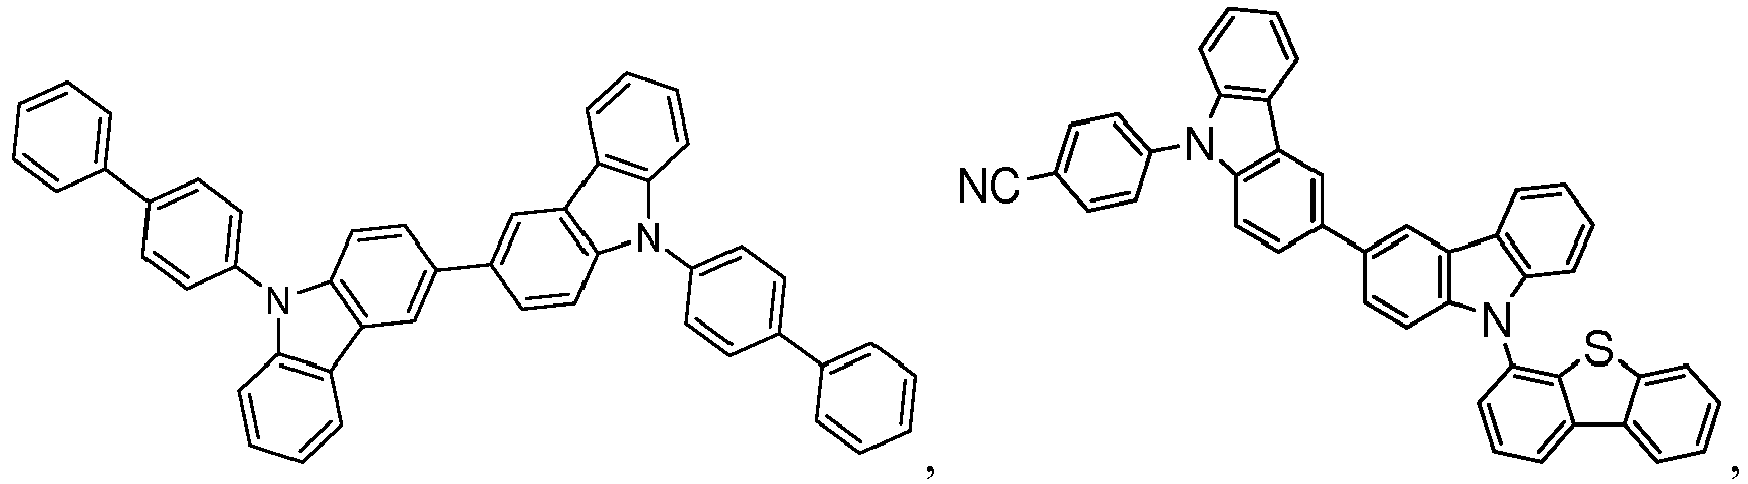 Figure imgb0827